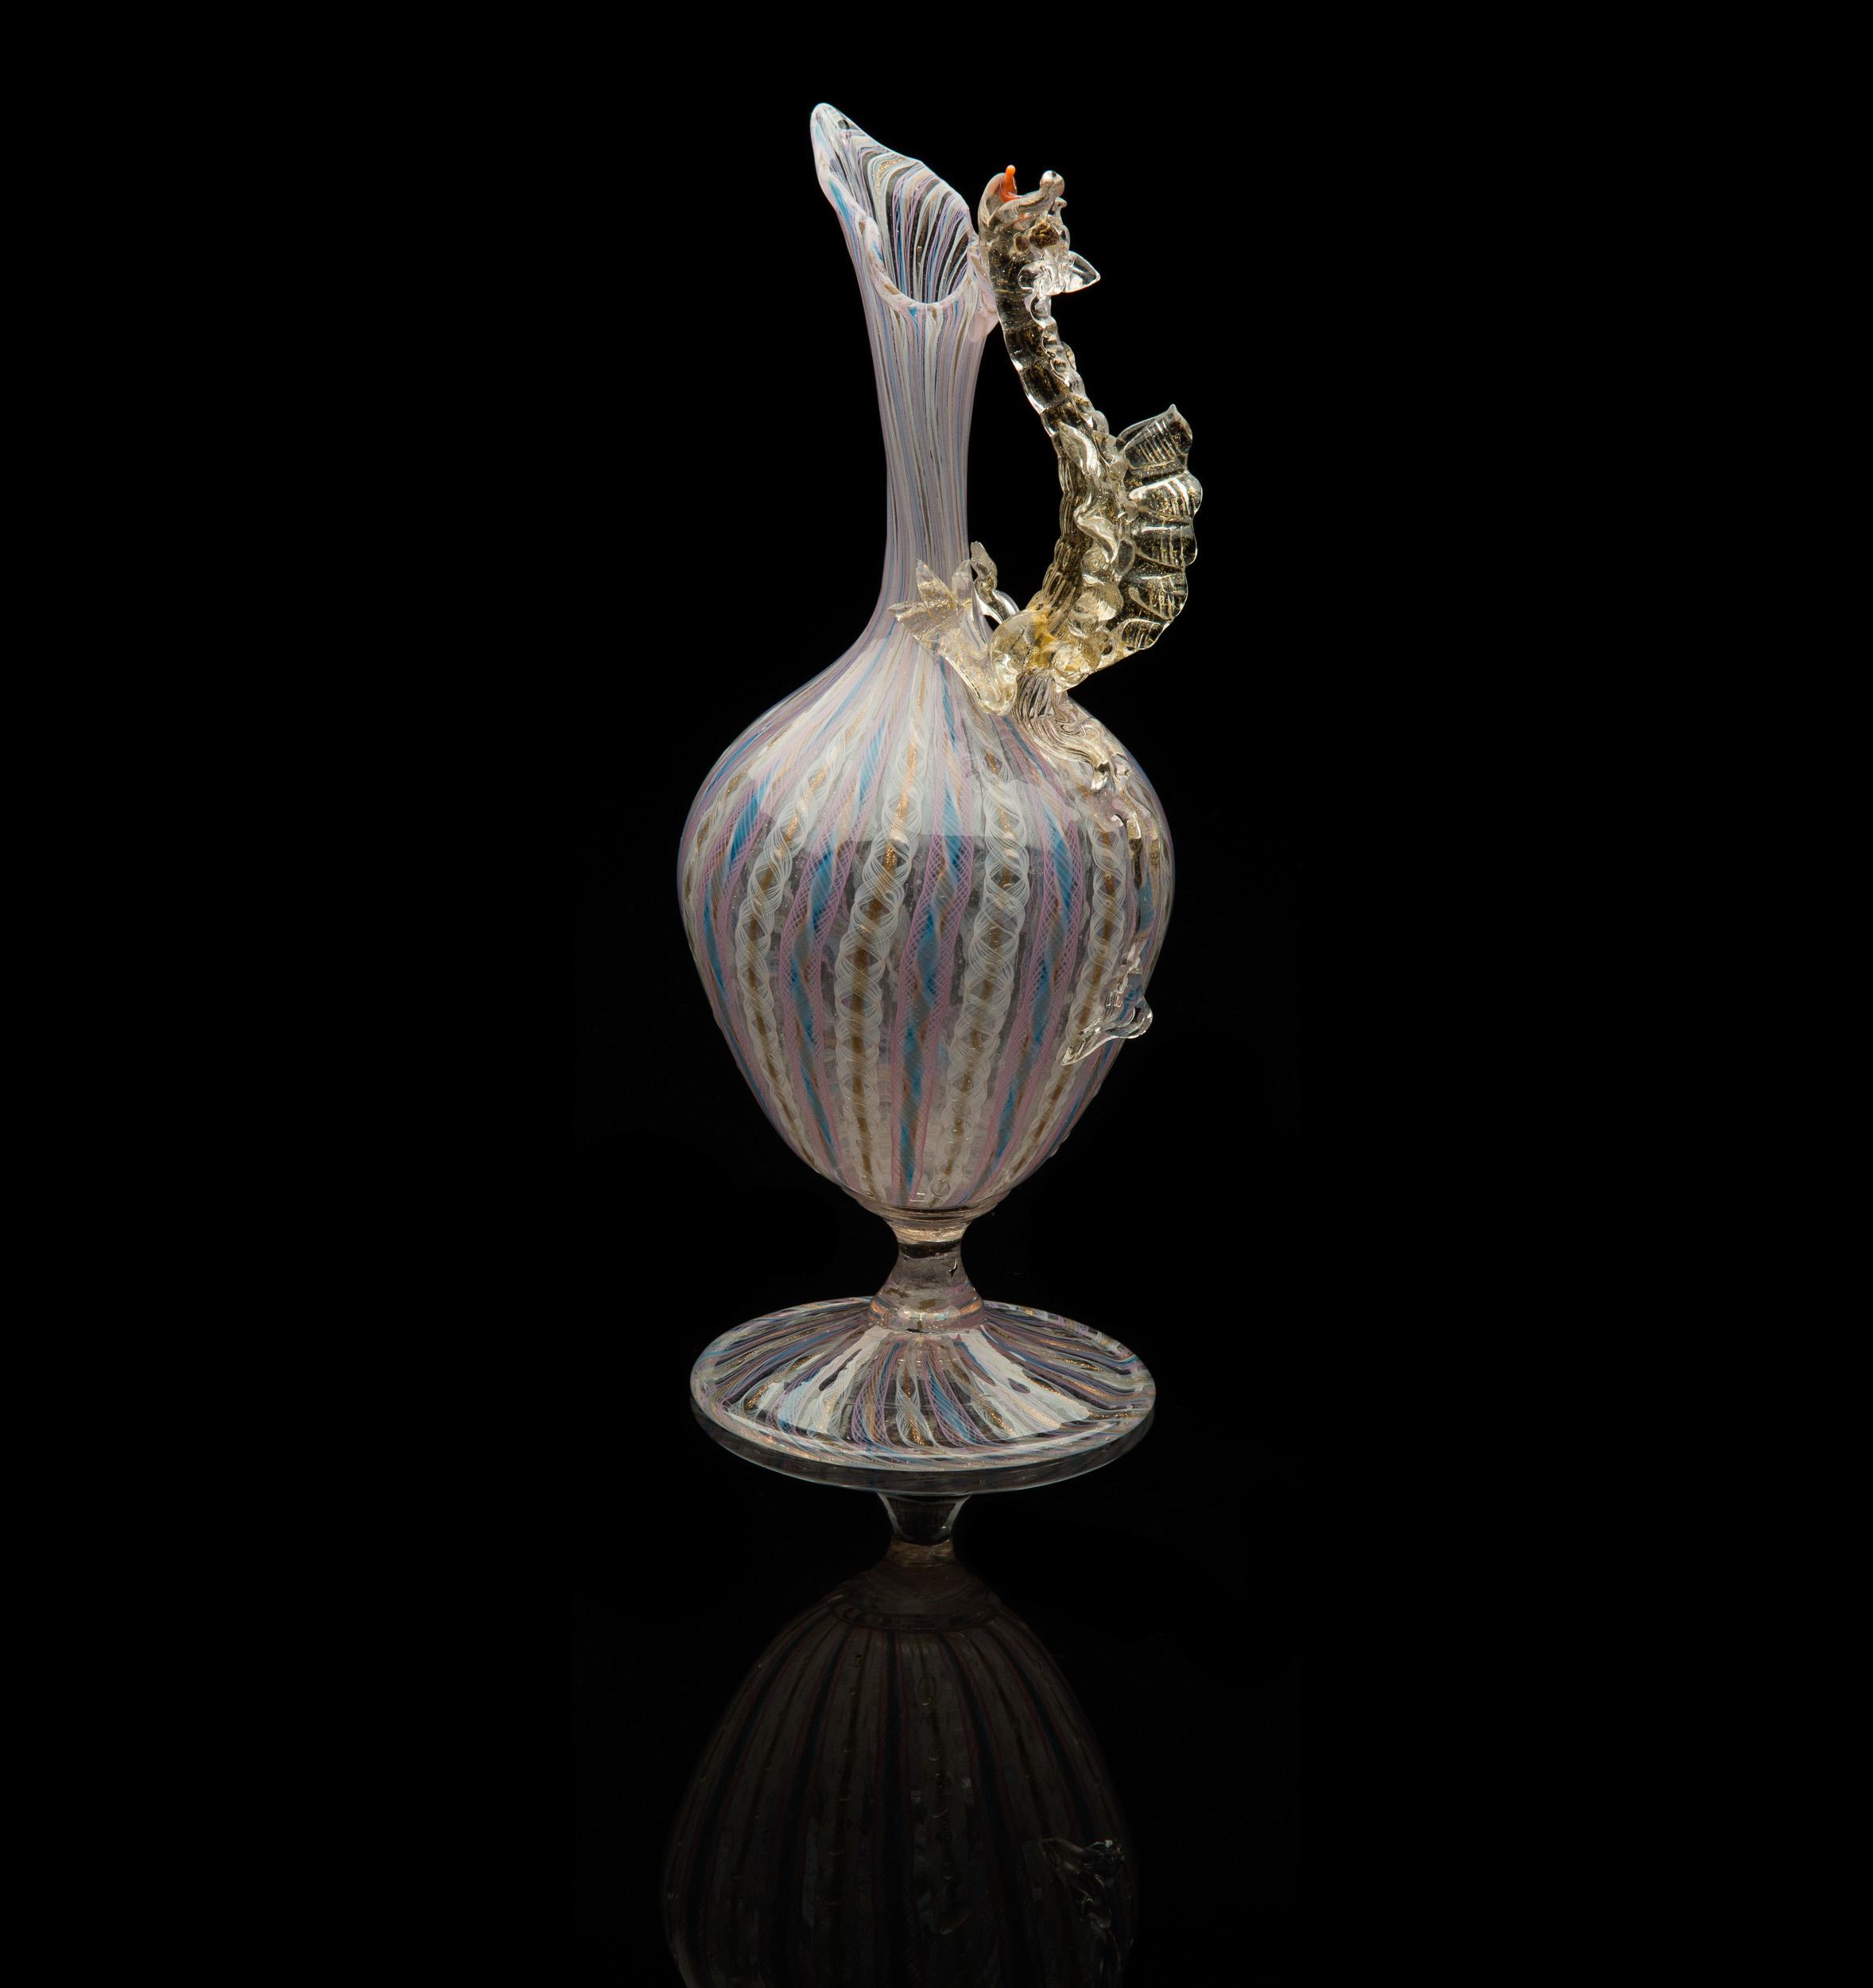 Salviati and Company, Dragon Handle Ewer (circa 1885, glass, 9 1/4 inches), VV.577